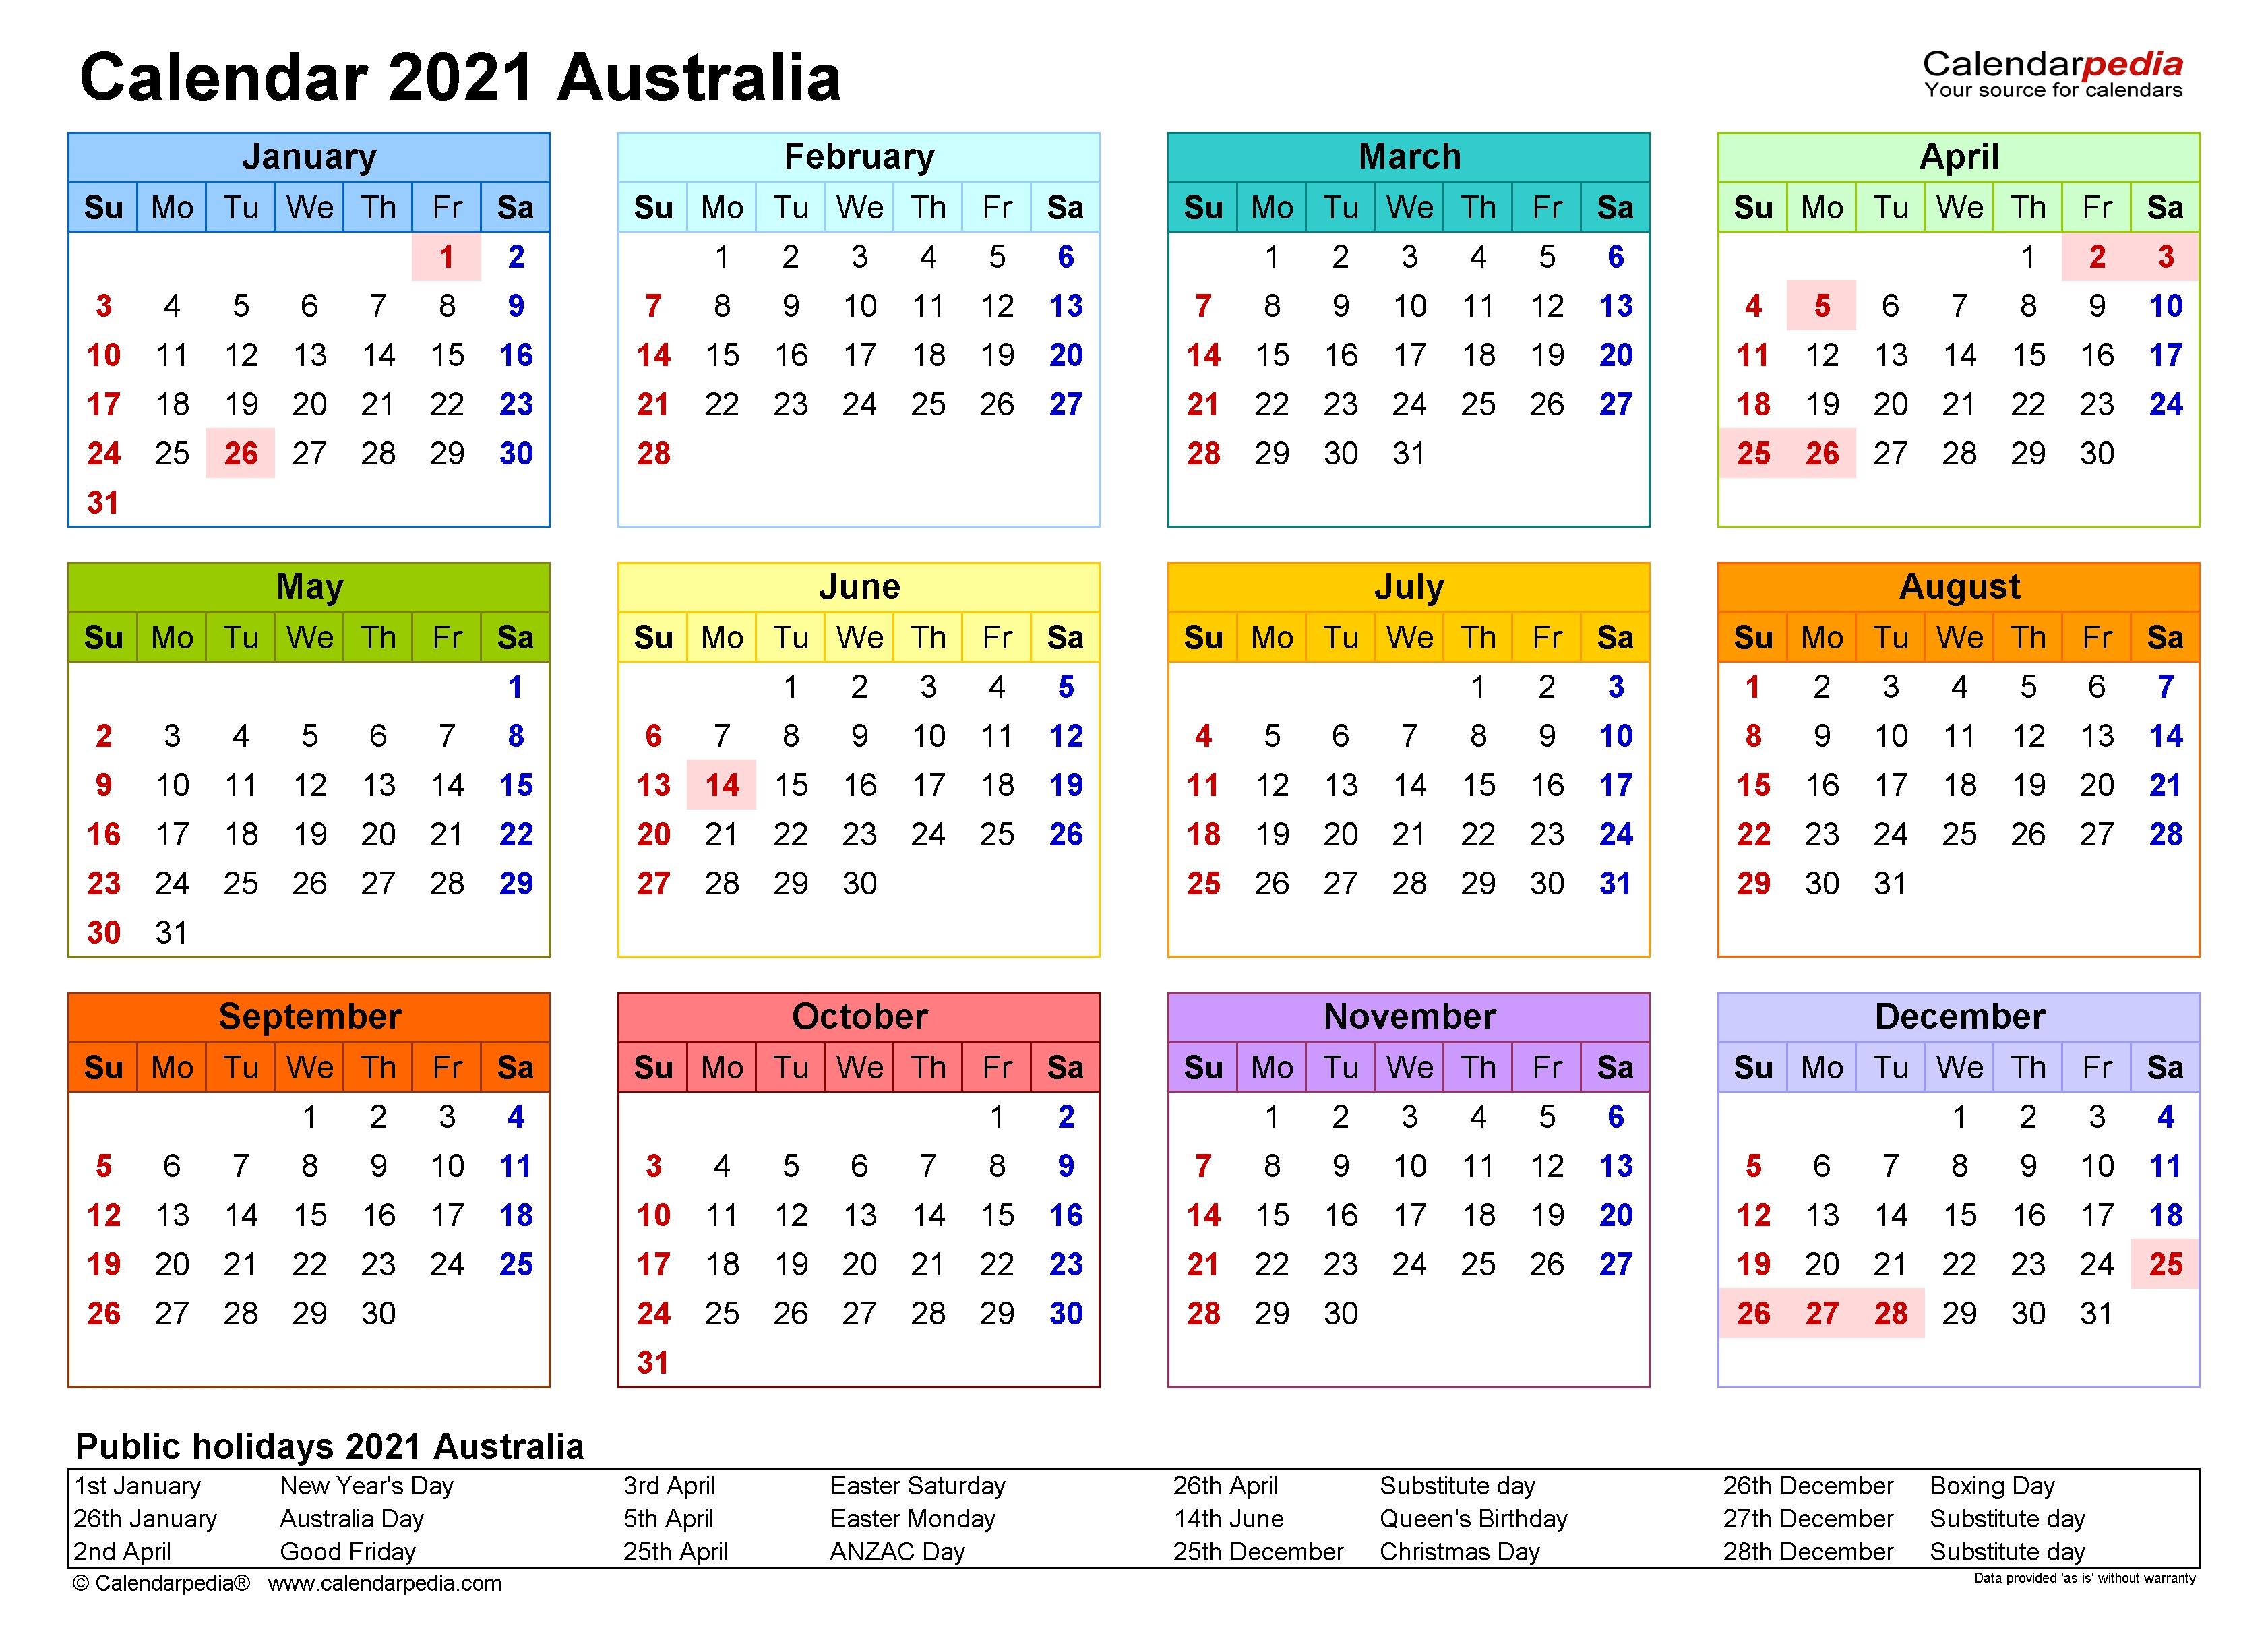 Australia Calendar 2021 - Free Printable Excel Templates  2021 Printable Calendar Free Full Page